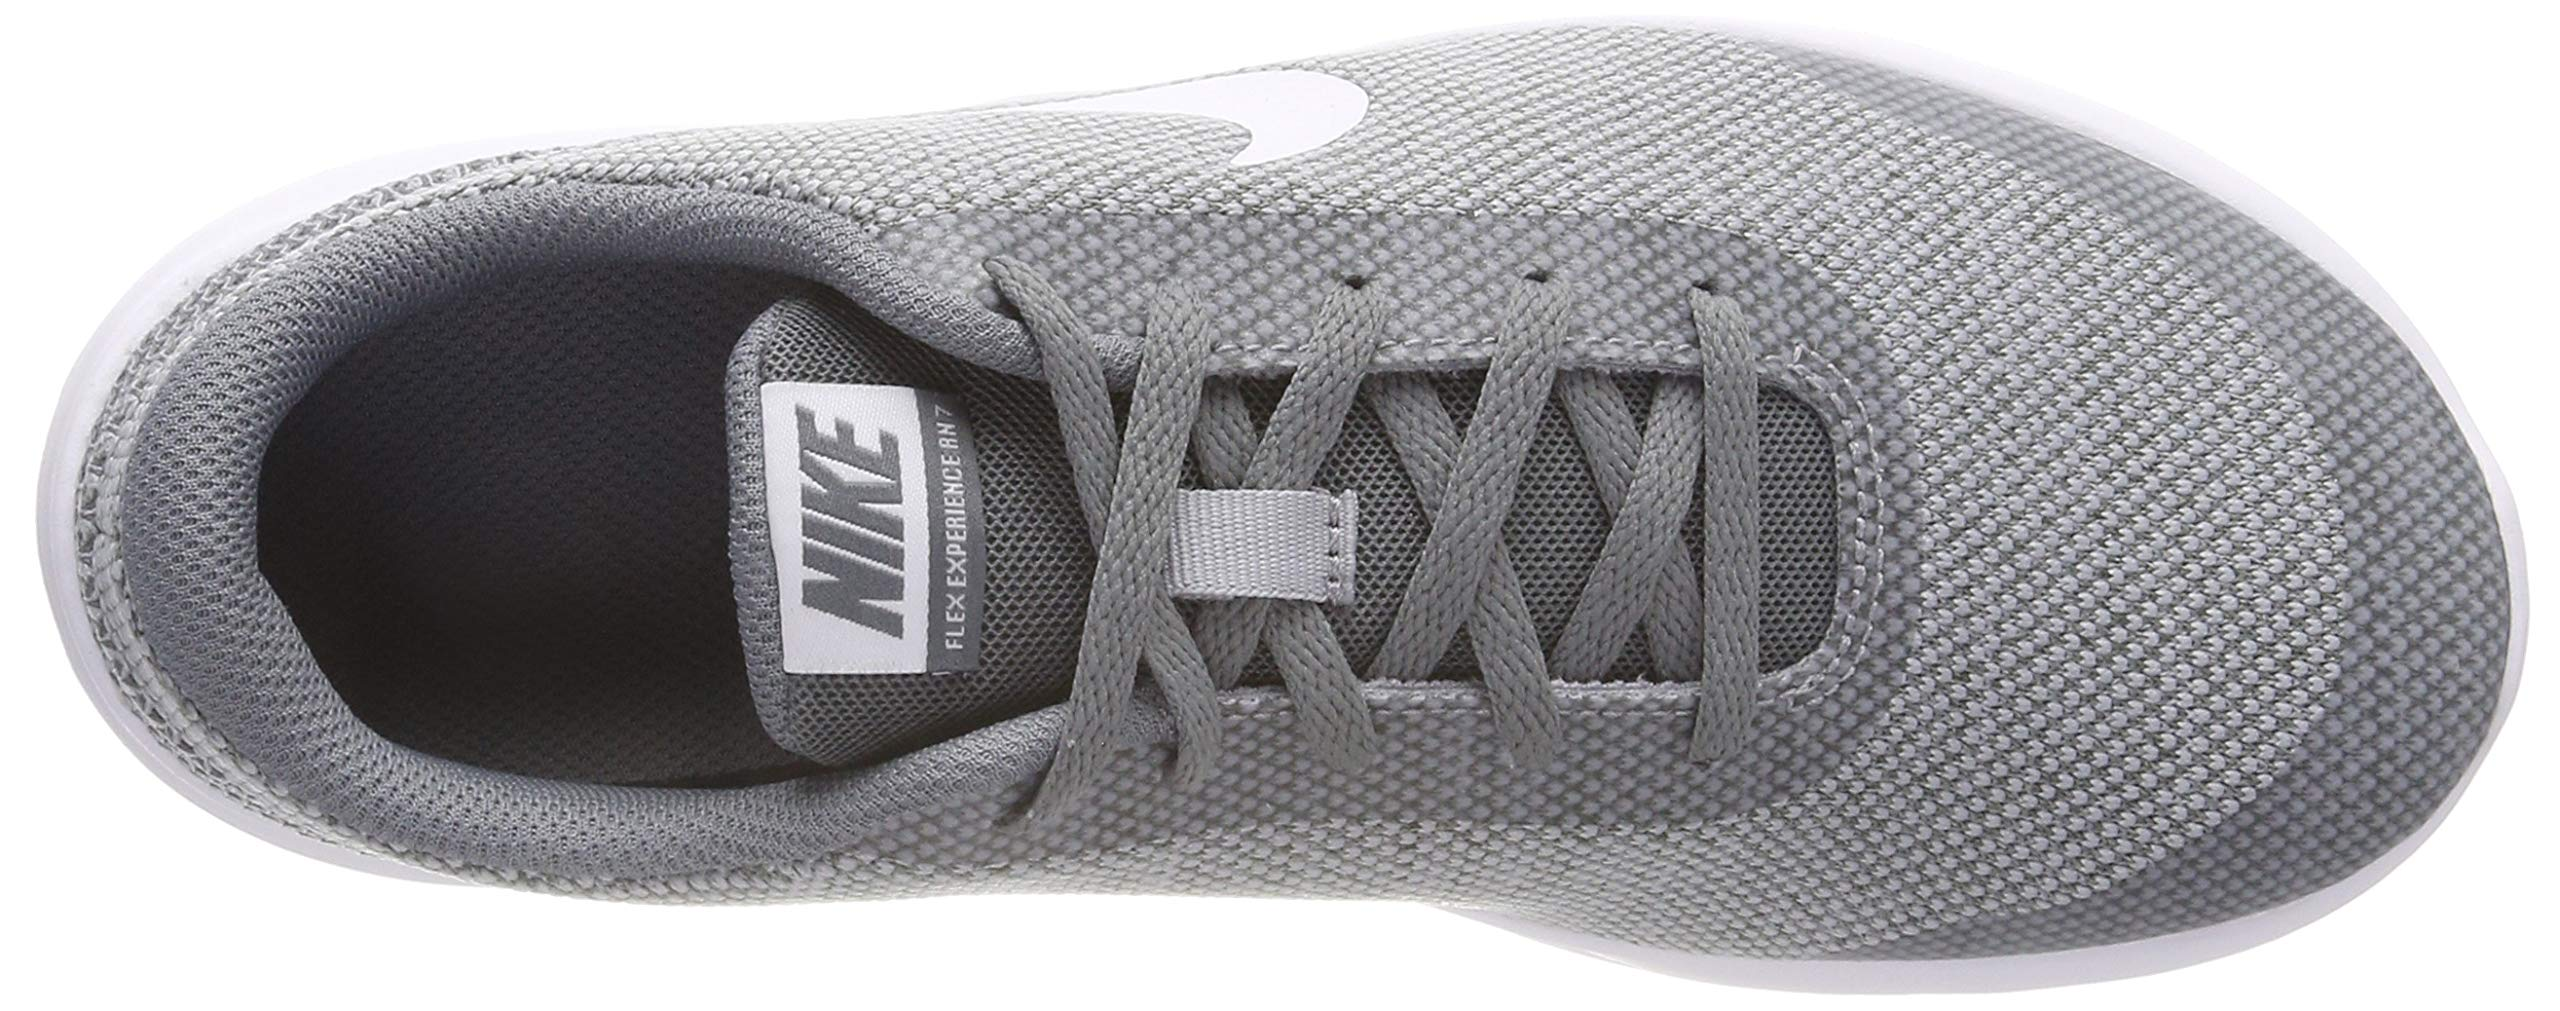 Nike Flex Experience Rn 7 (gs) Big Kids 943284-003 Size 4 by Nike (Image #7)